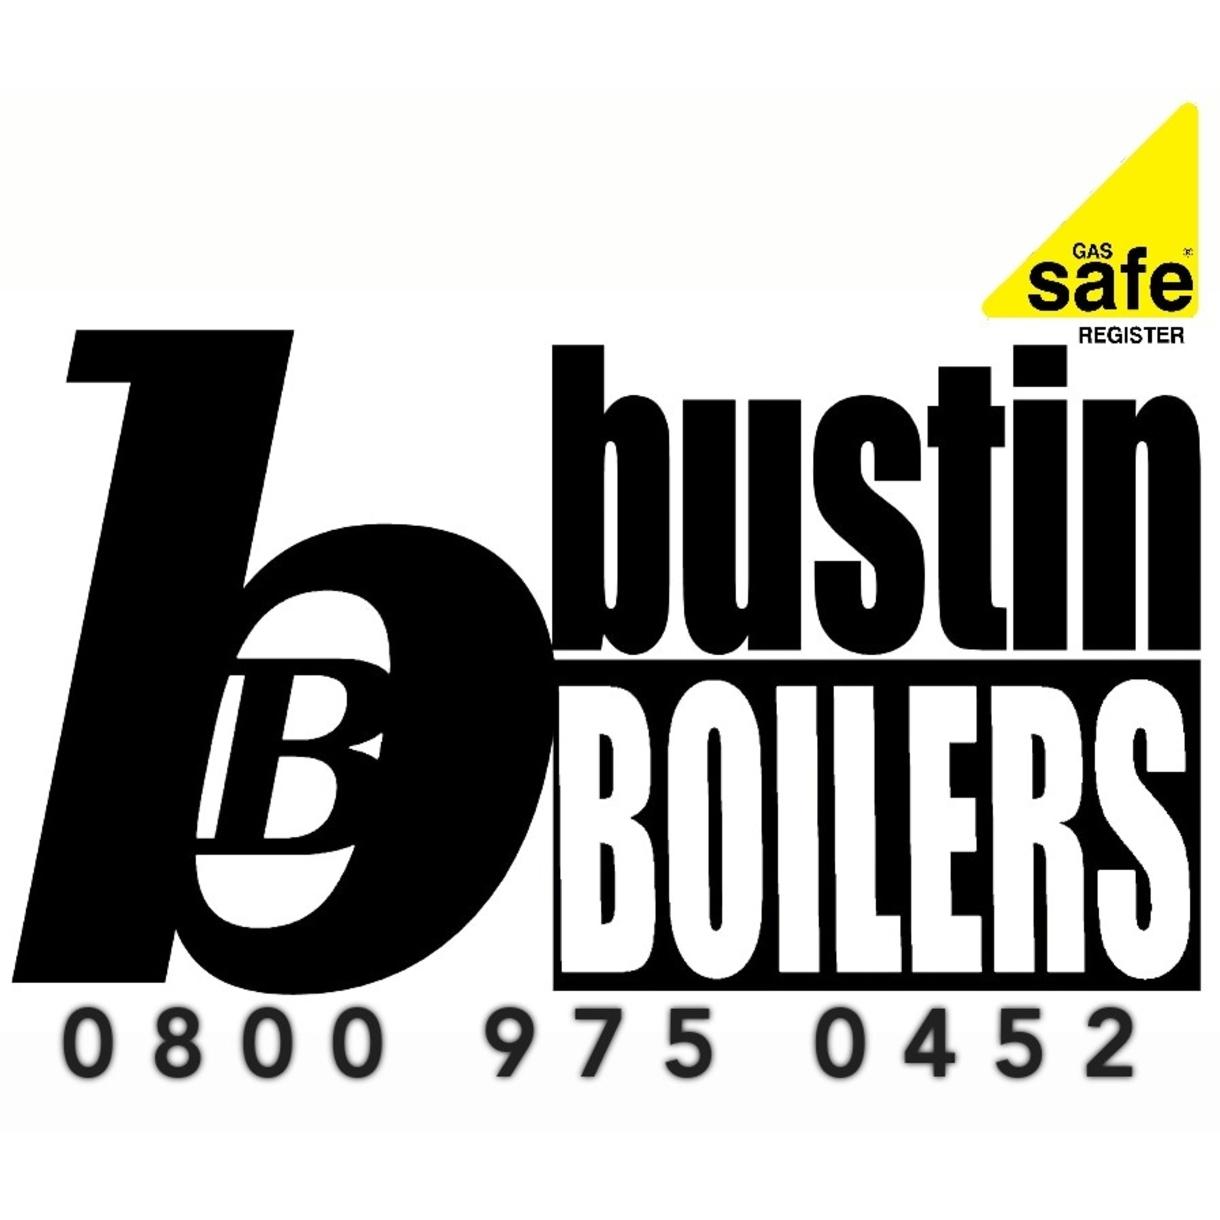 Bustin Boilers Ltd